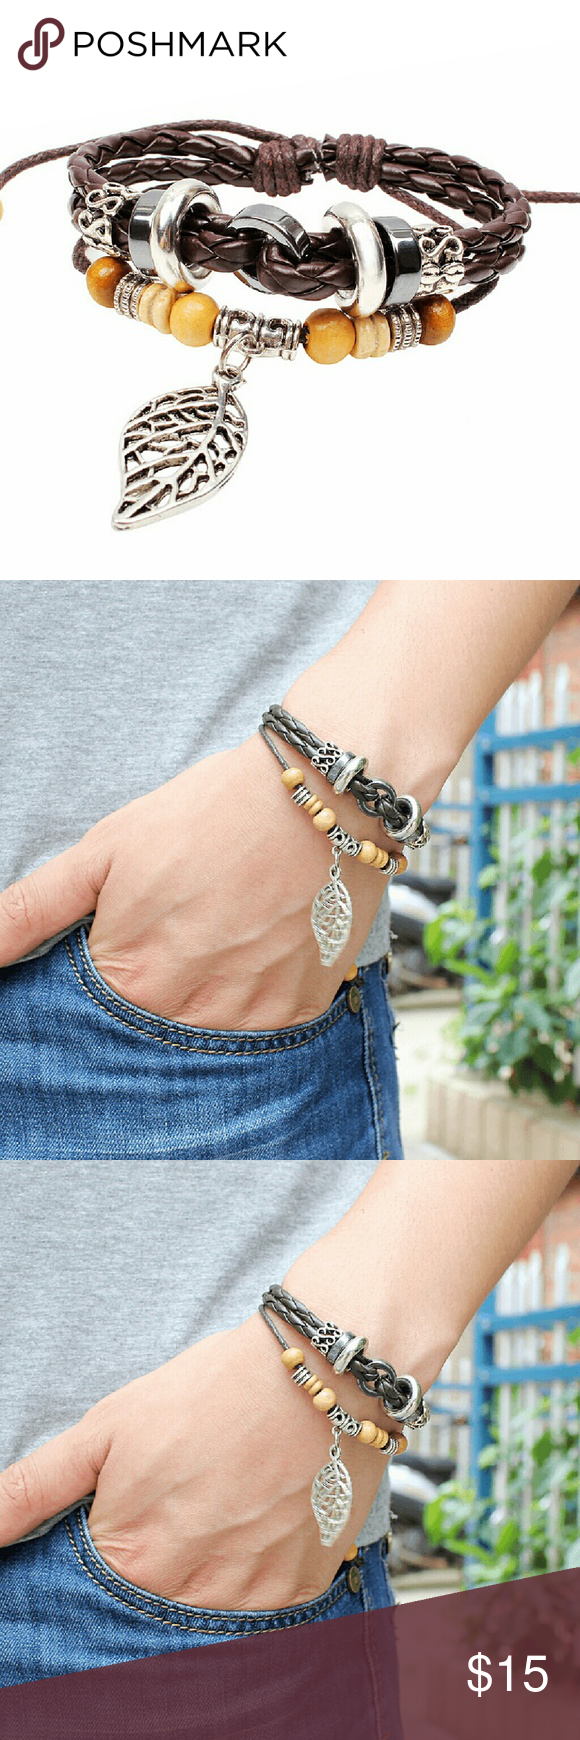 Leather bracelet with maple leaf pendant bohemian style braclet